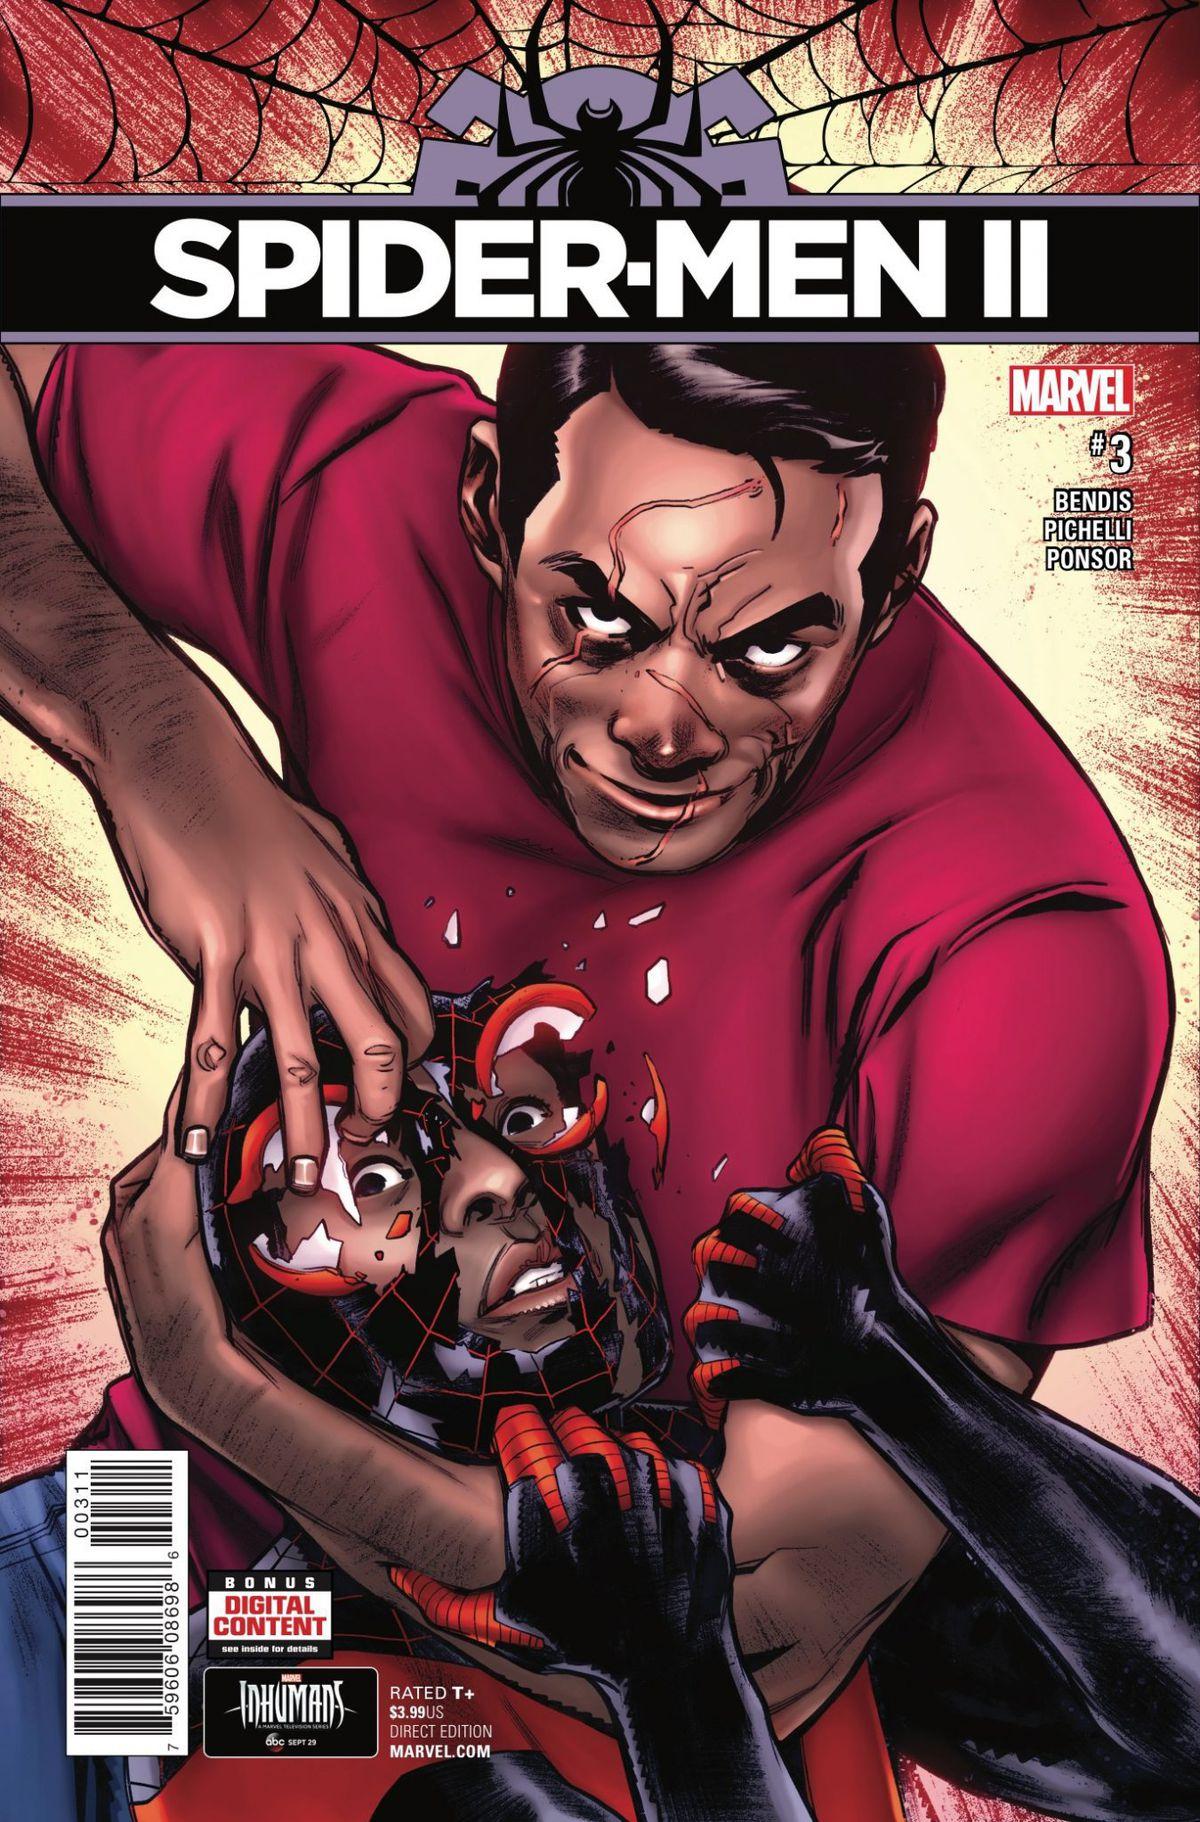 The cover of Spider-Men II #3, Marvel Comics (2017).